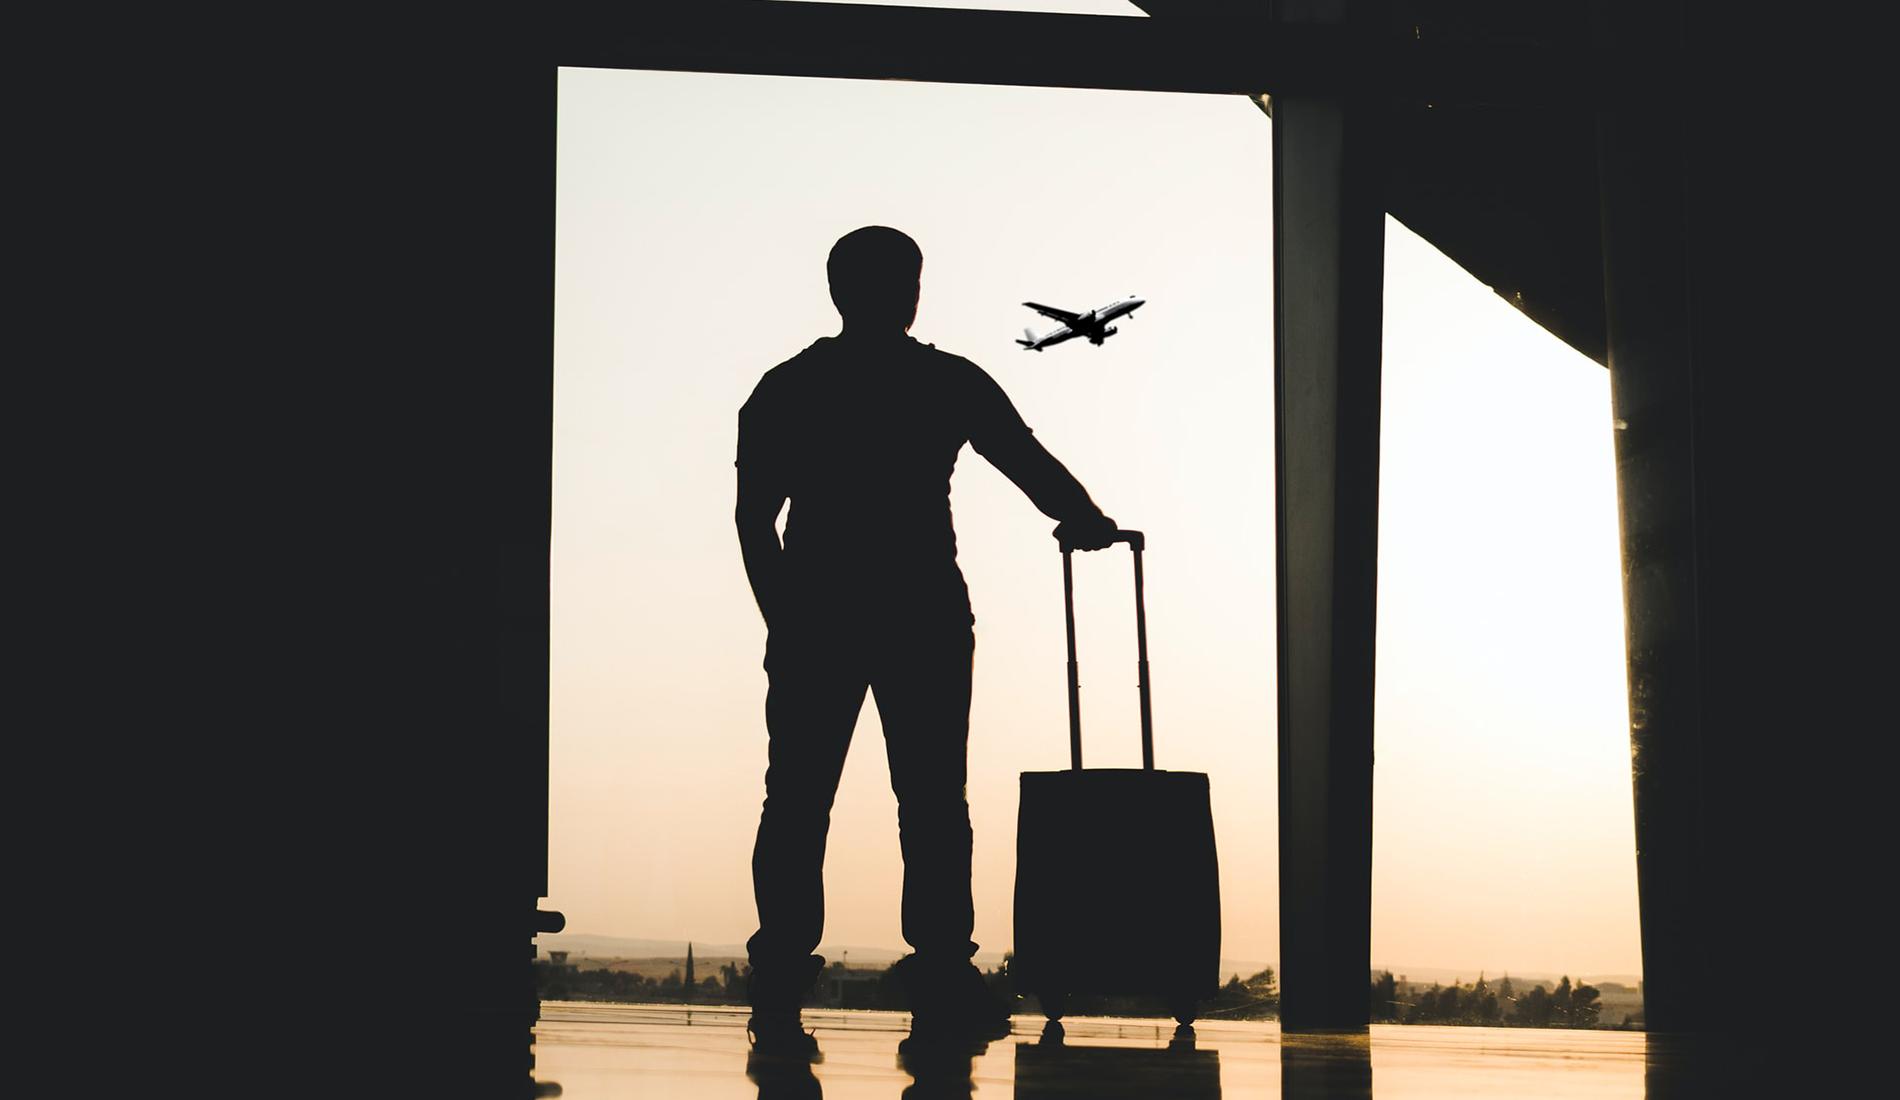 Airport - Unsplash / Yousef Alfuhigi